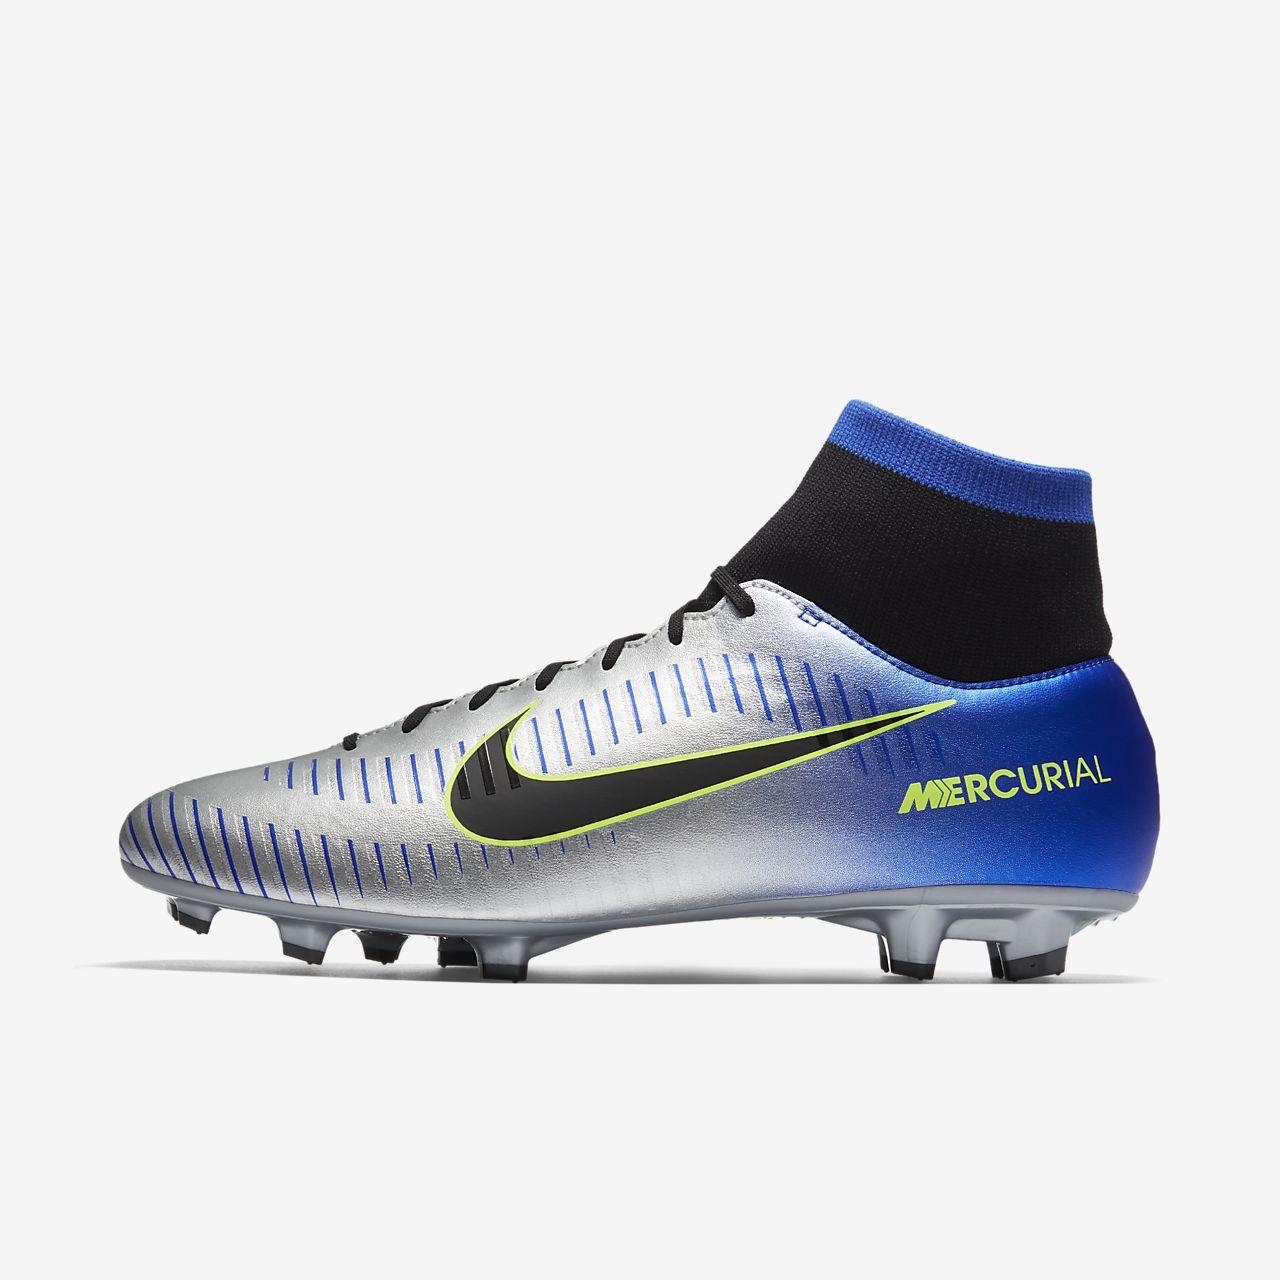 Neymar Chaussures Nike Mercurial Victoire En Taille 35 Hommes 3rIKGE4o